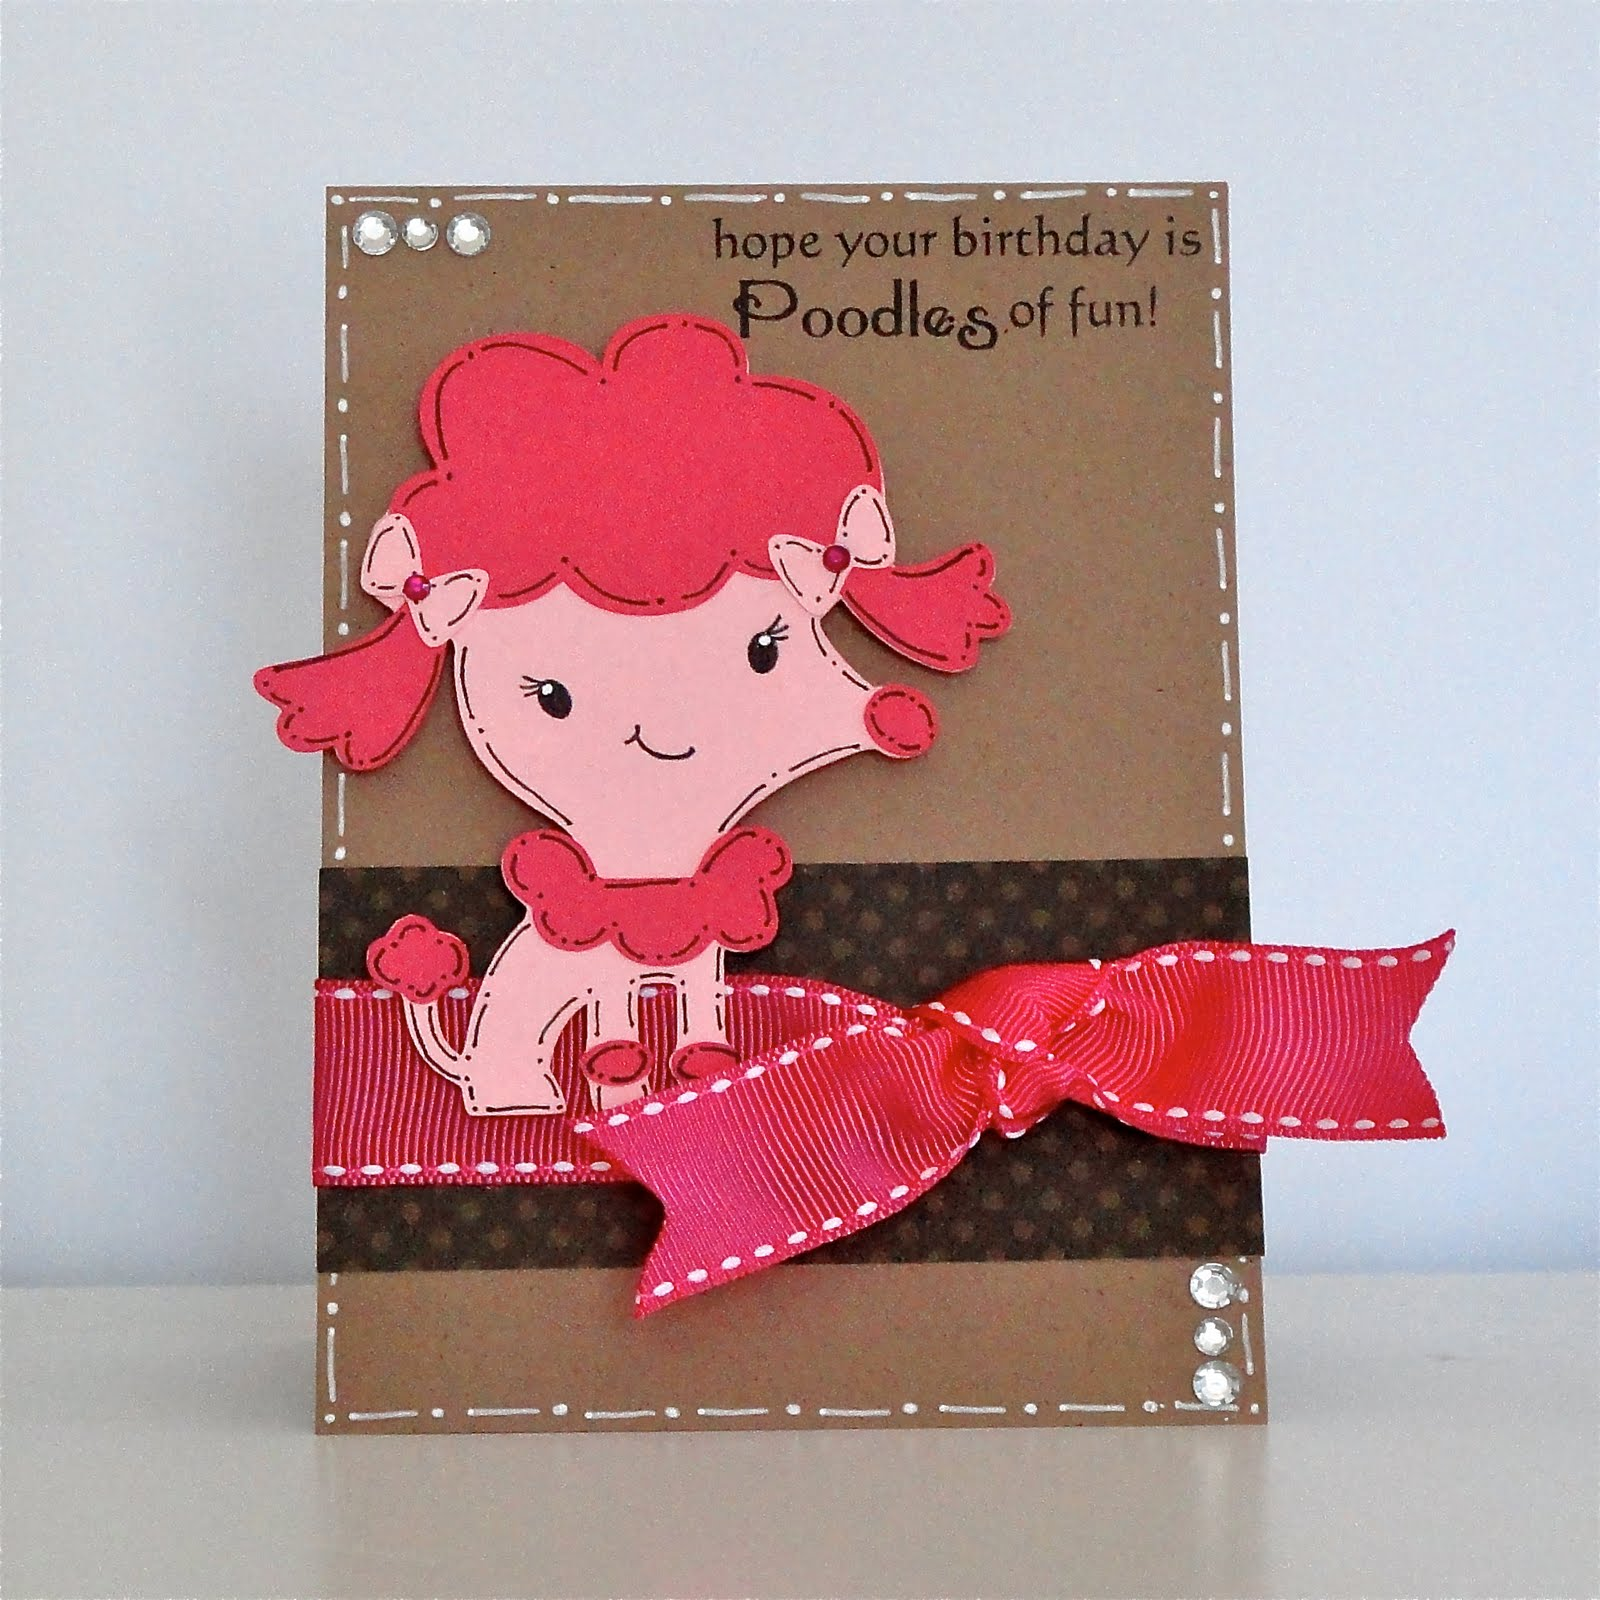 it's so cute 7 cute cards